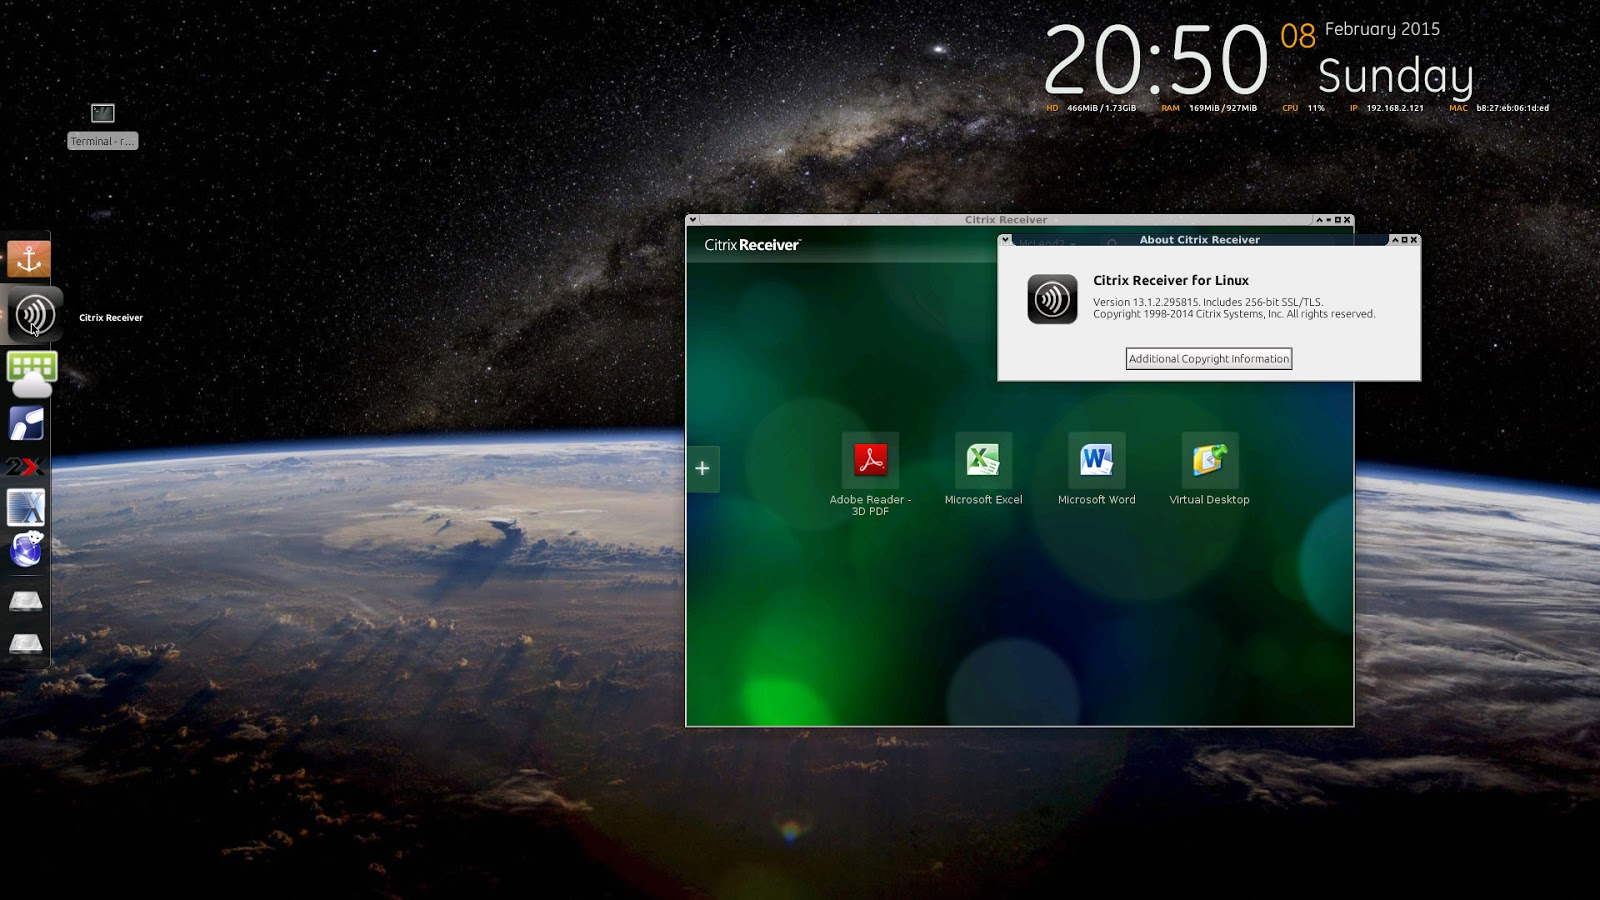 Raspberry pi vm download